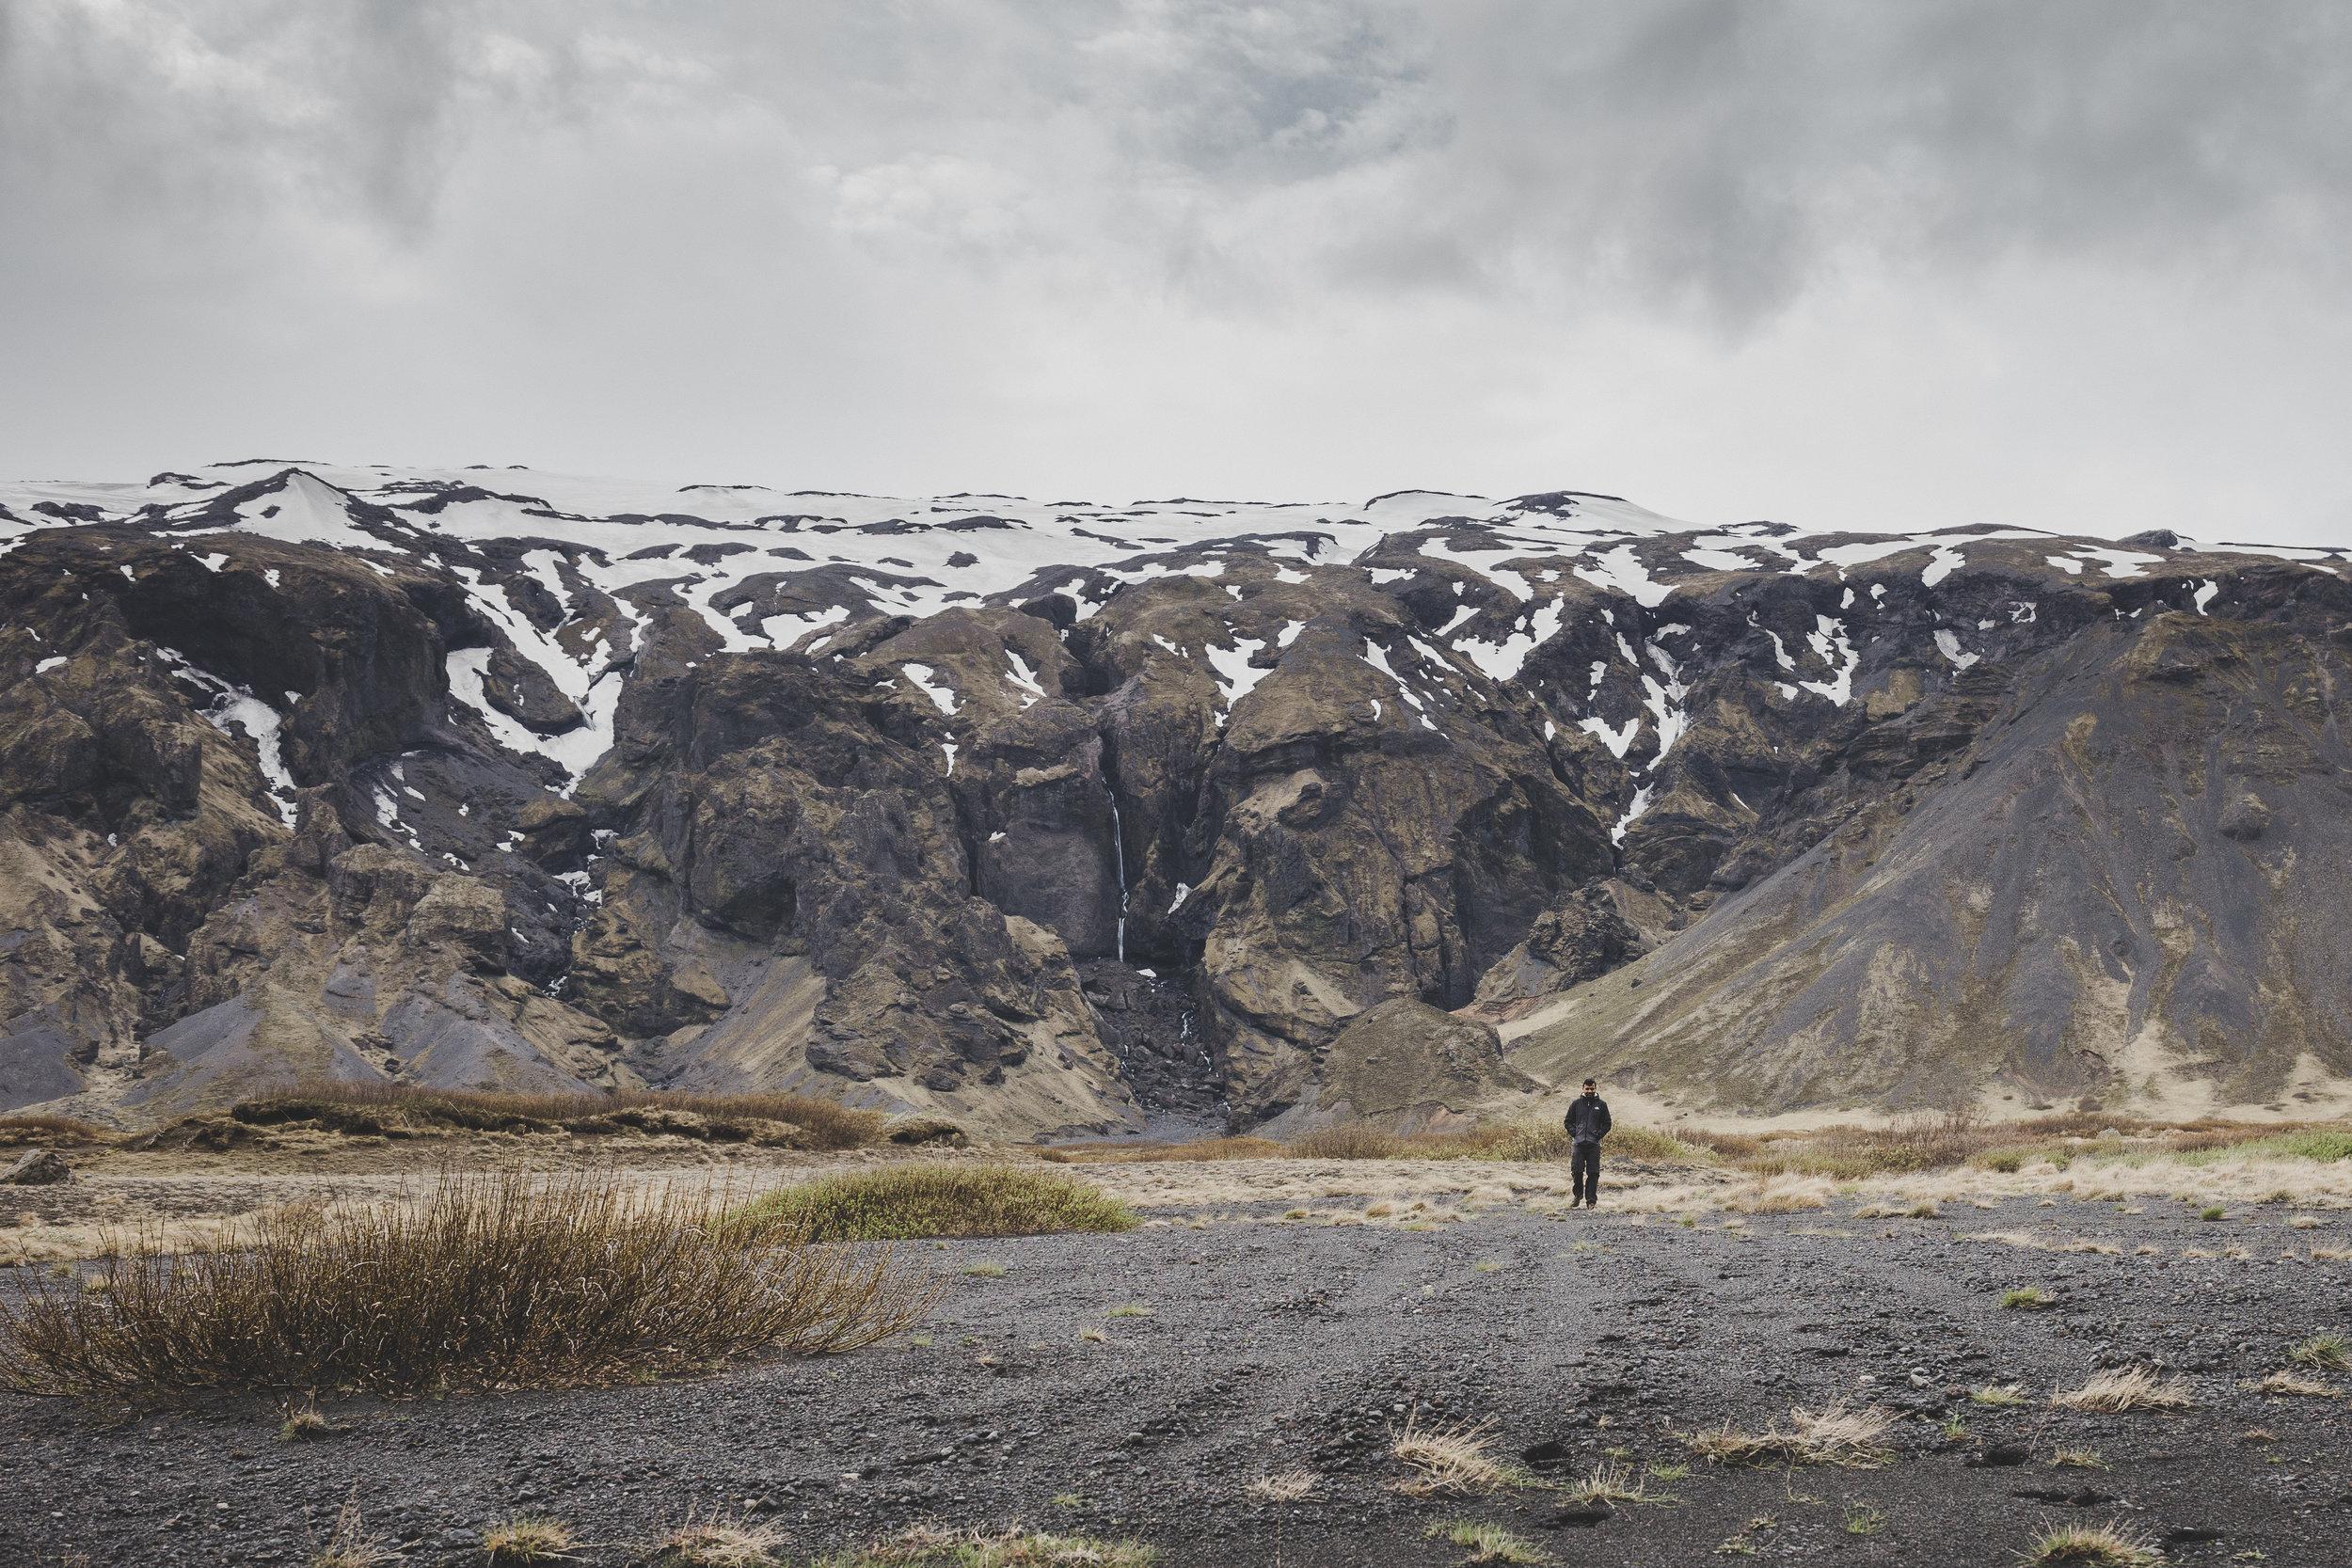 Sharad and the great views of Thórsmörk